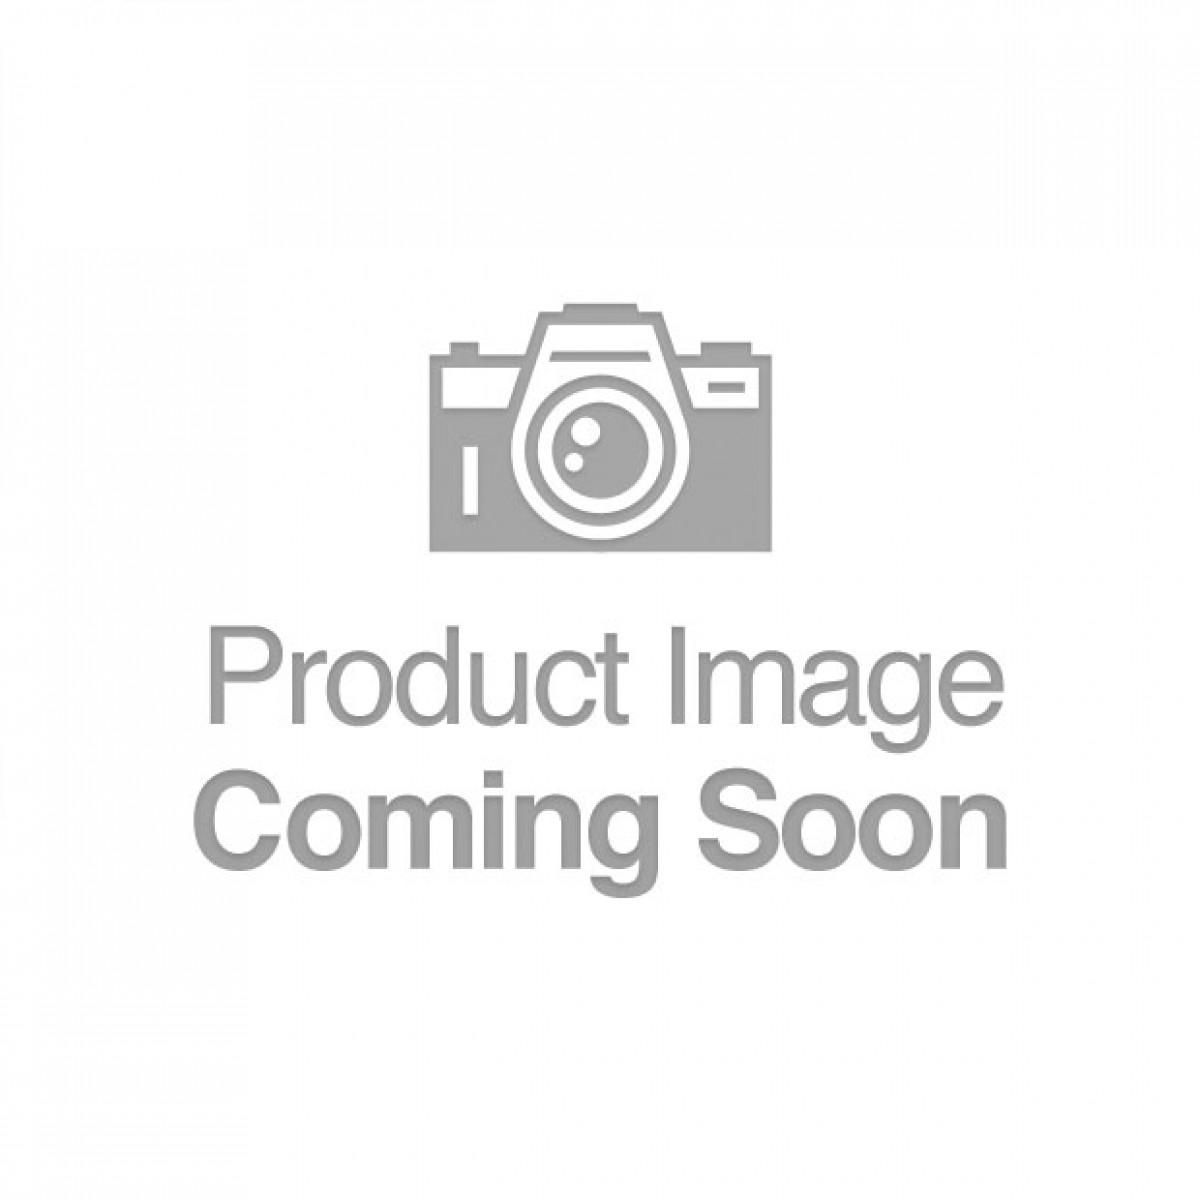 Pretty Love Ingram Electro Shock Vibrator - Fuchsia